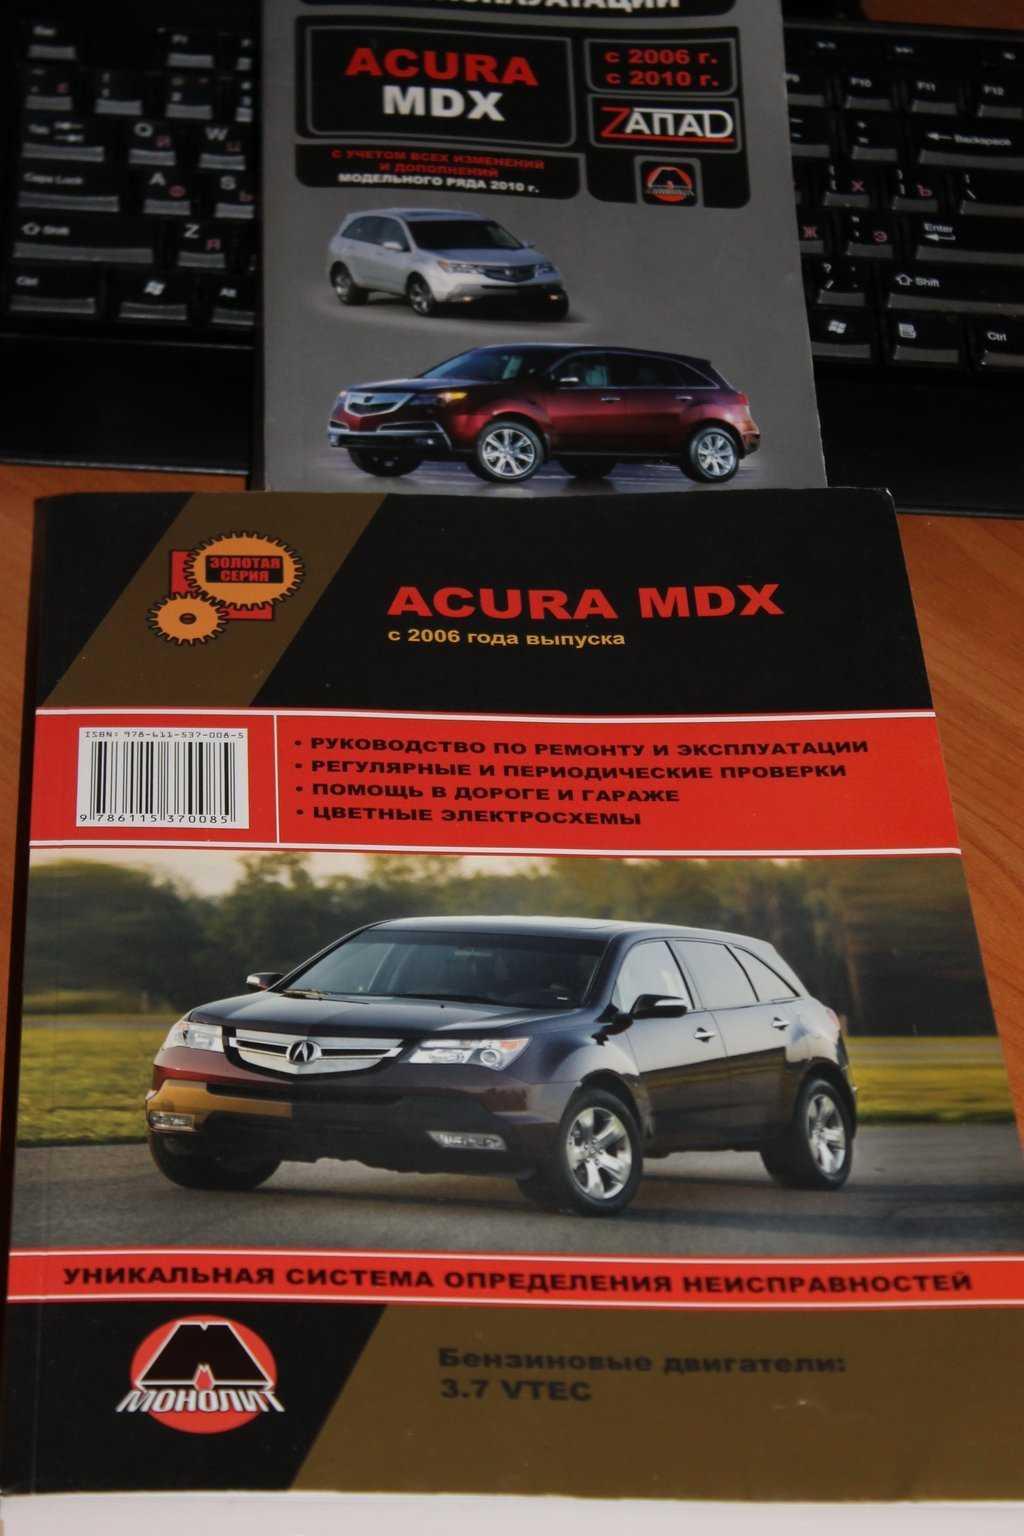 Acura mdx с 2010 года, запуск двигателя инструкция онлайн